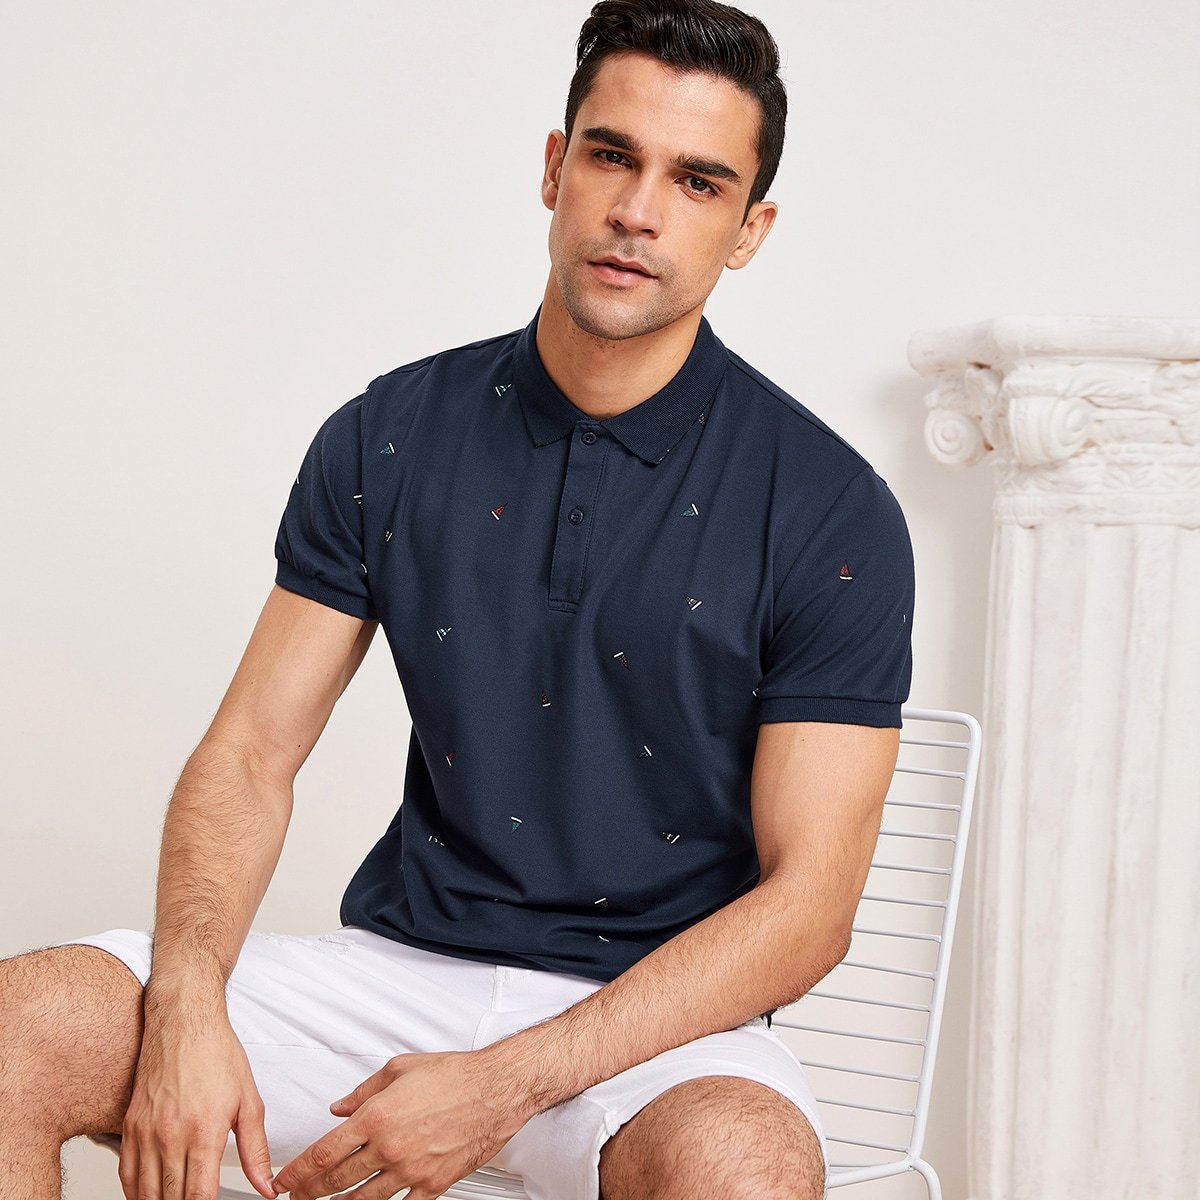 SHEIN coupon: Men Sailboat Print Polo Shirt